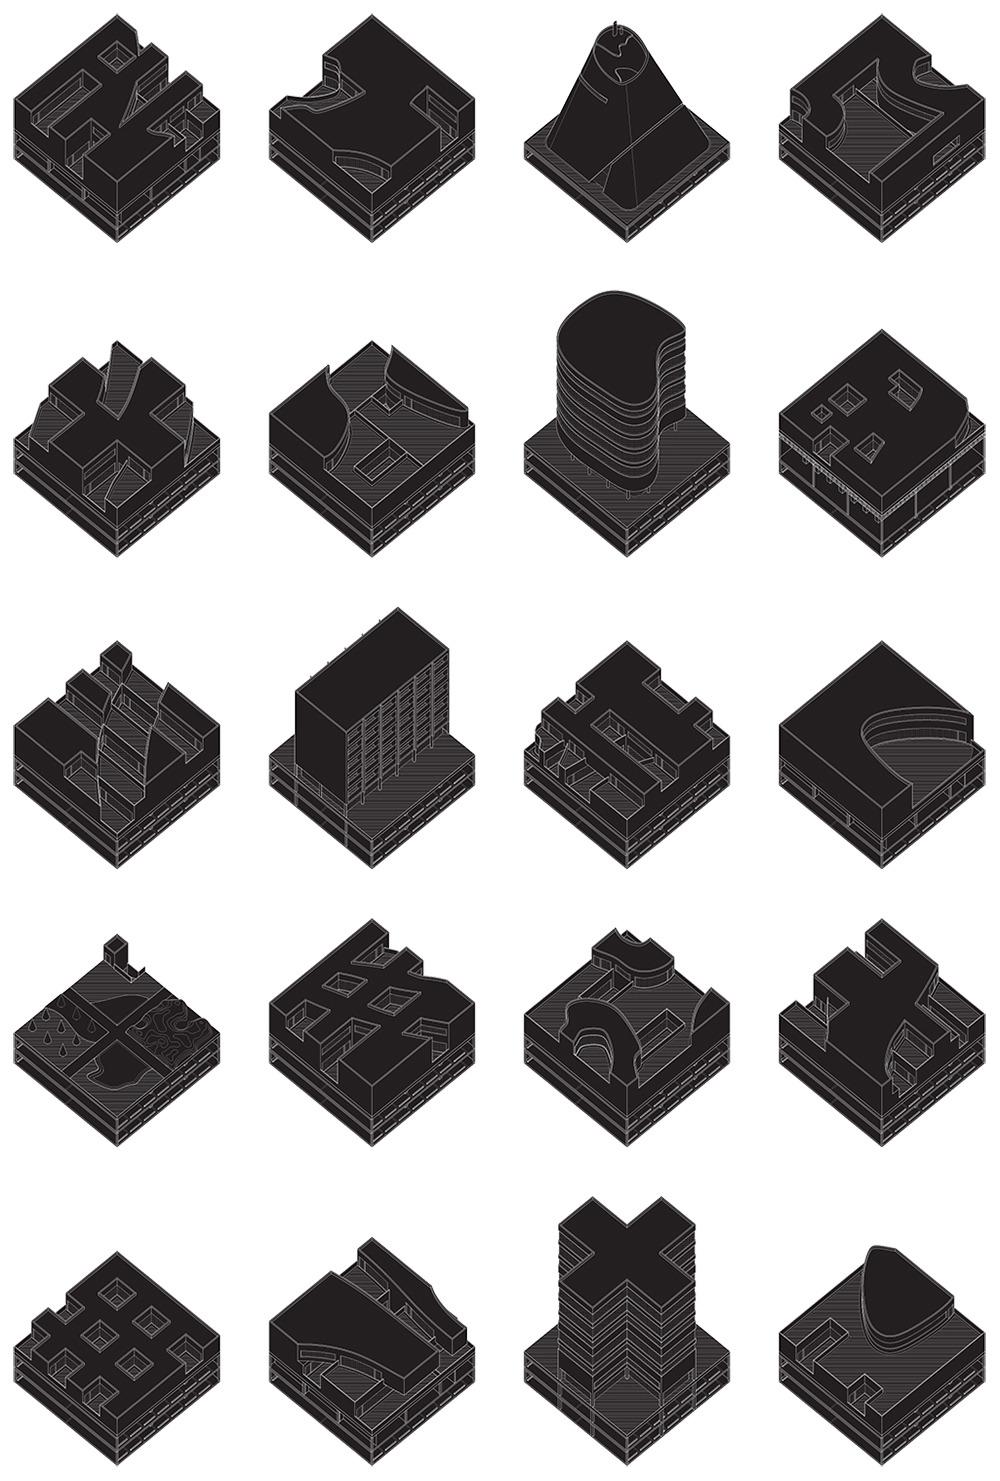 conceptdiagram -  concept DIAGRAM  - #architecturalconceptdiagram #architectural... -  conceptdiagram –  concept DIAGRAM  – #architecturalconceptdiagram #architectural… –  concep - #architectural #architecturalconceptdiagram #concept #ConceptDiagram #conceptdiagram #diagram #UrbanPlanning